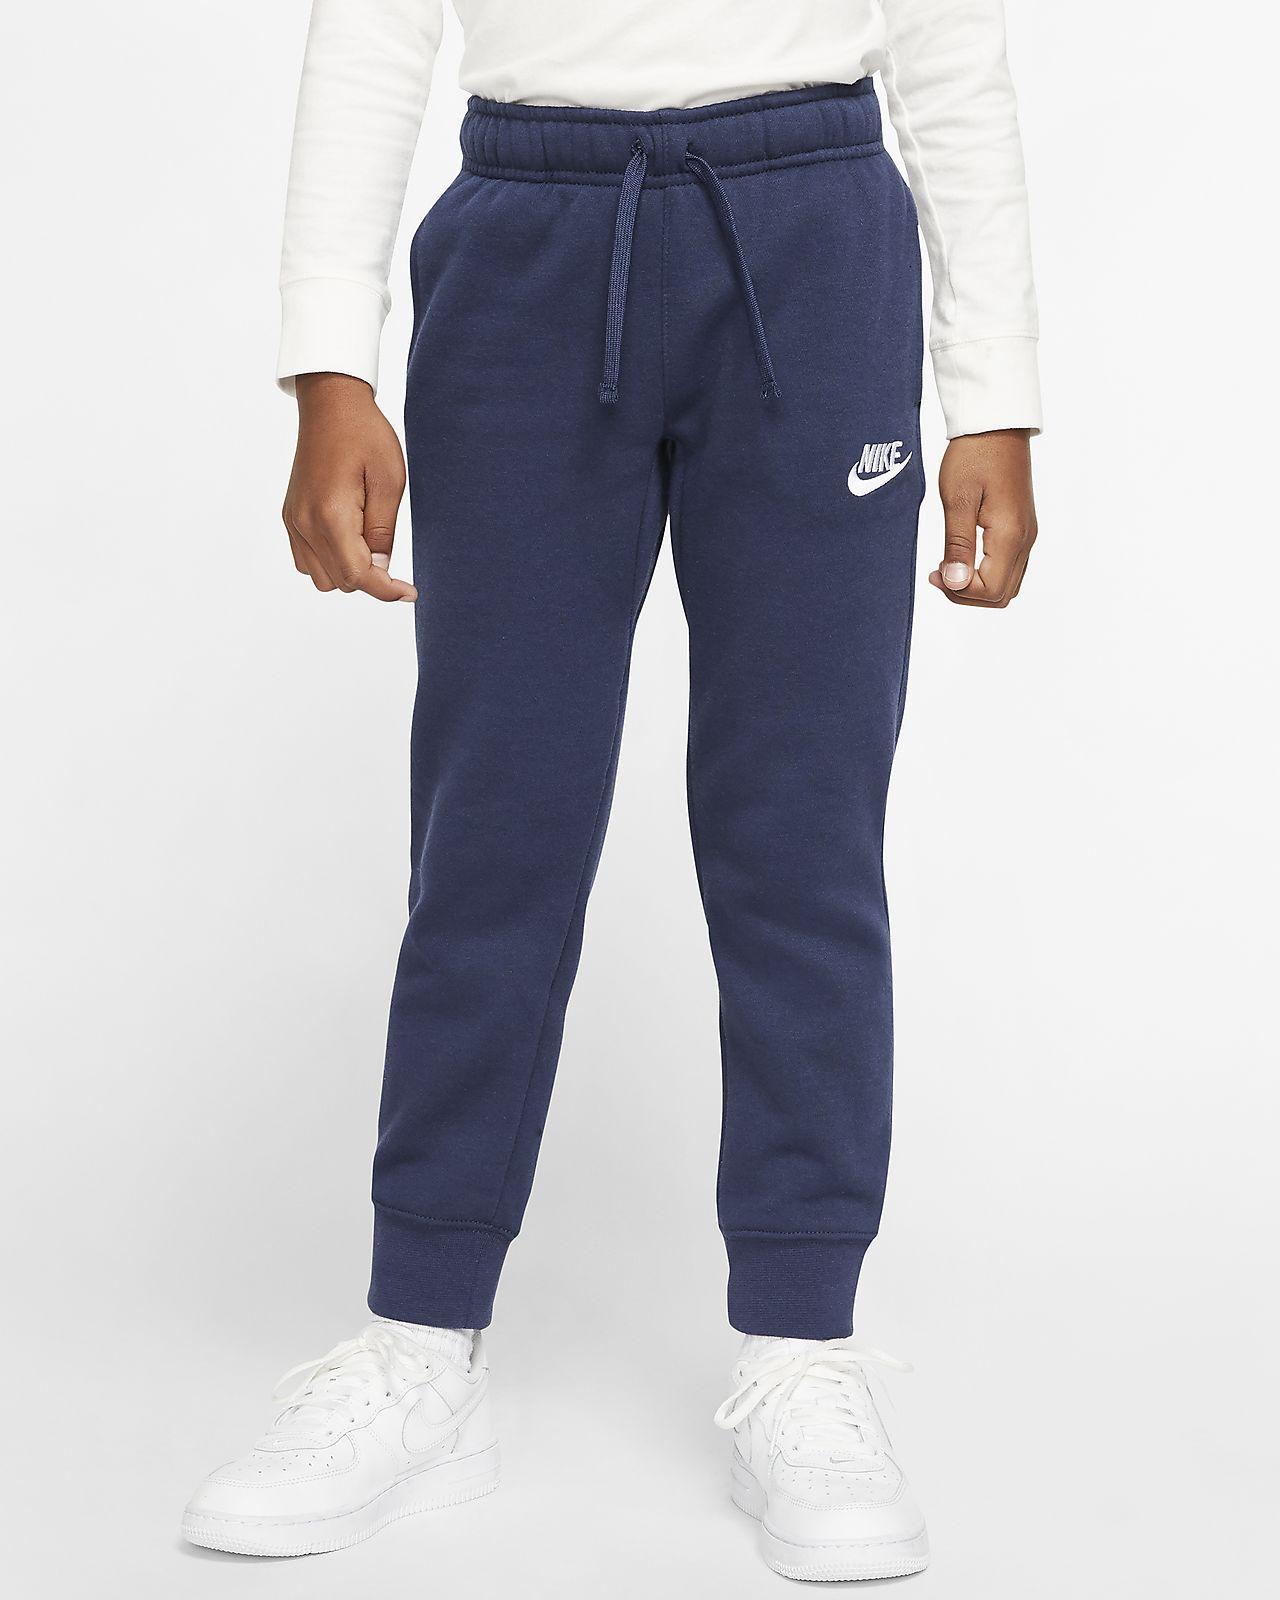 Pantalon Nike Club Fleece pour Jeune enfant